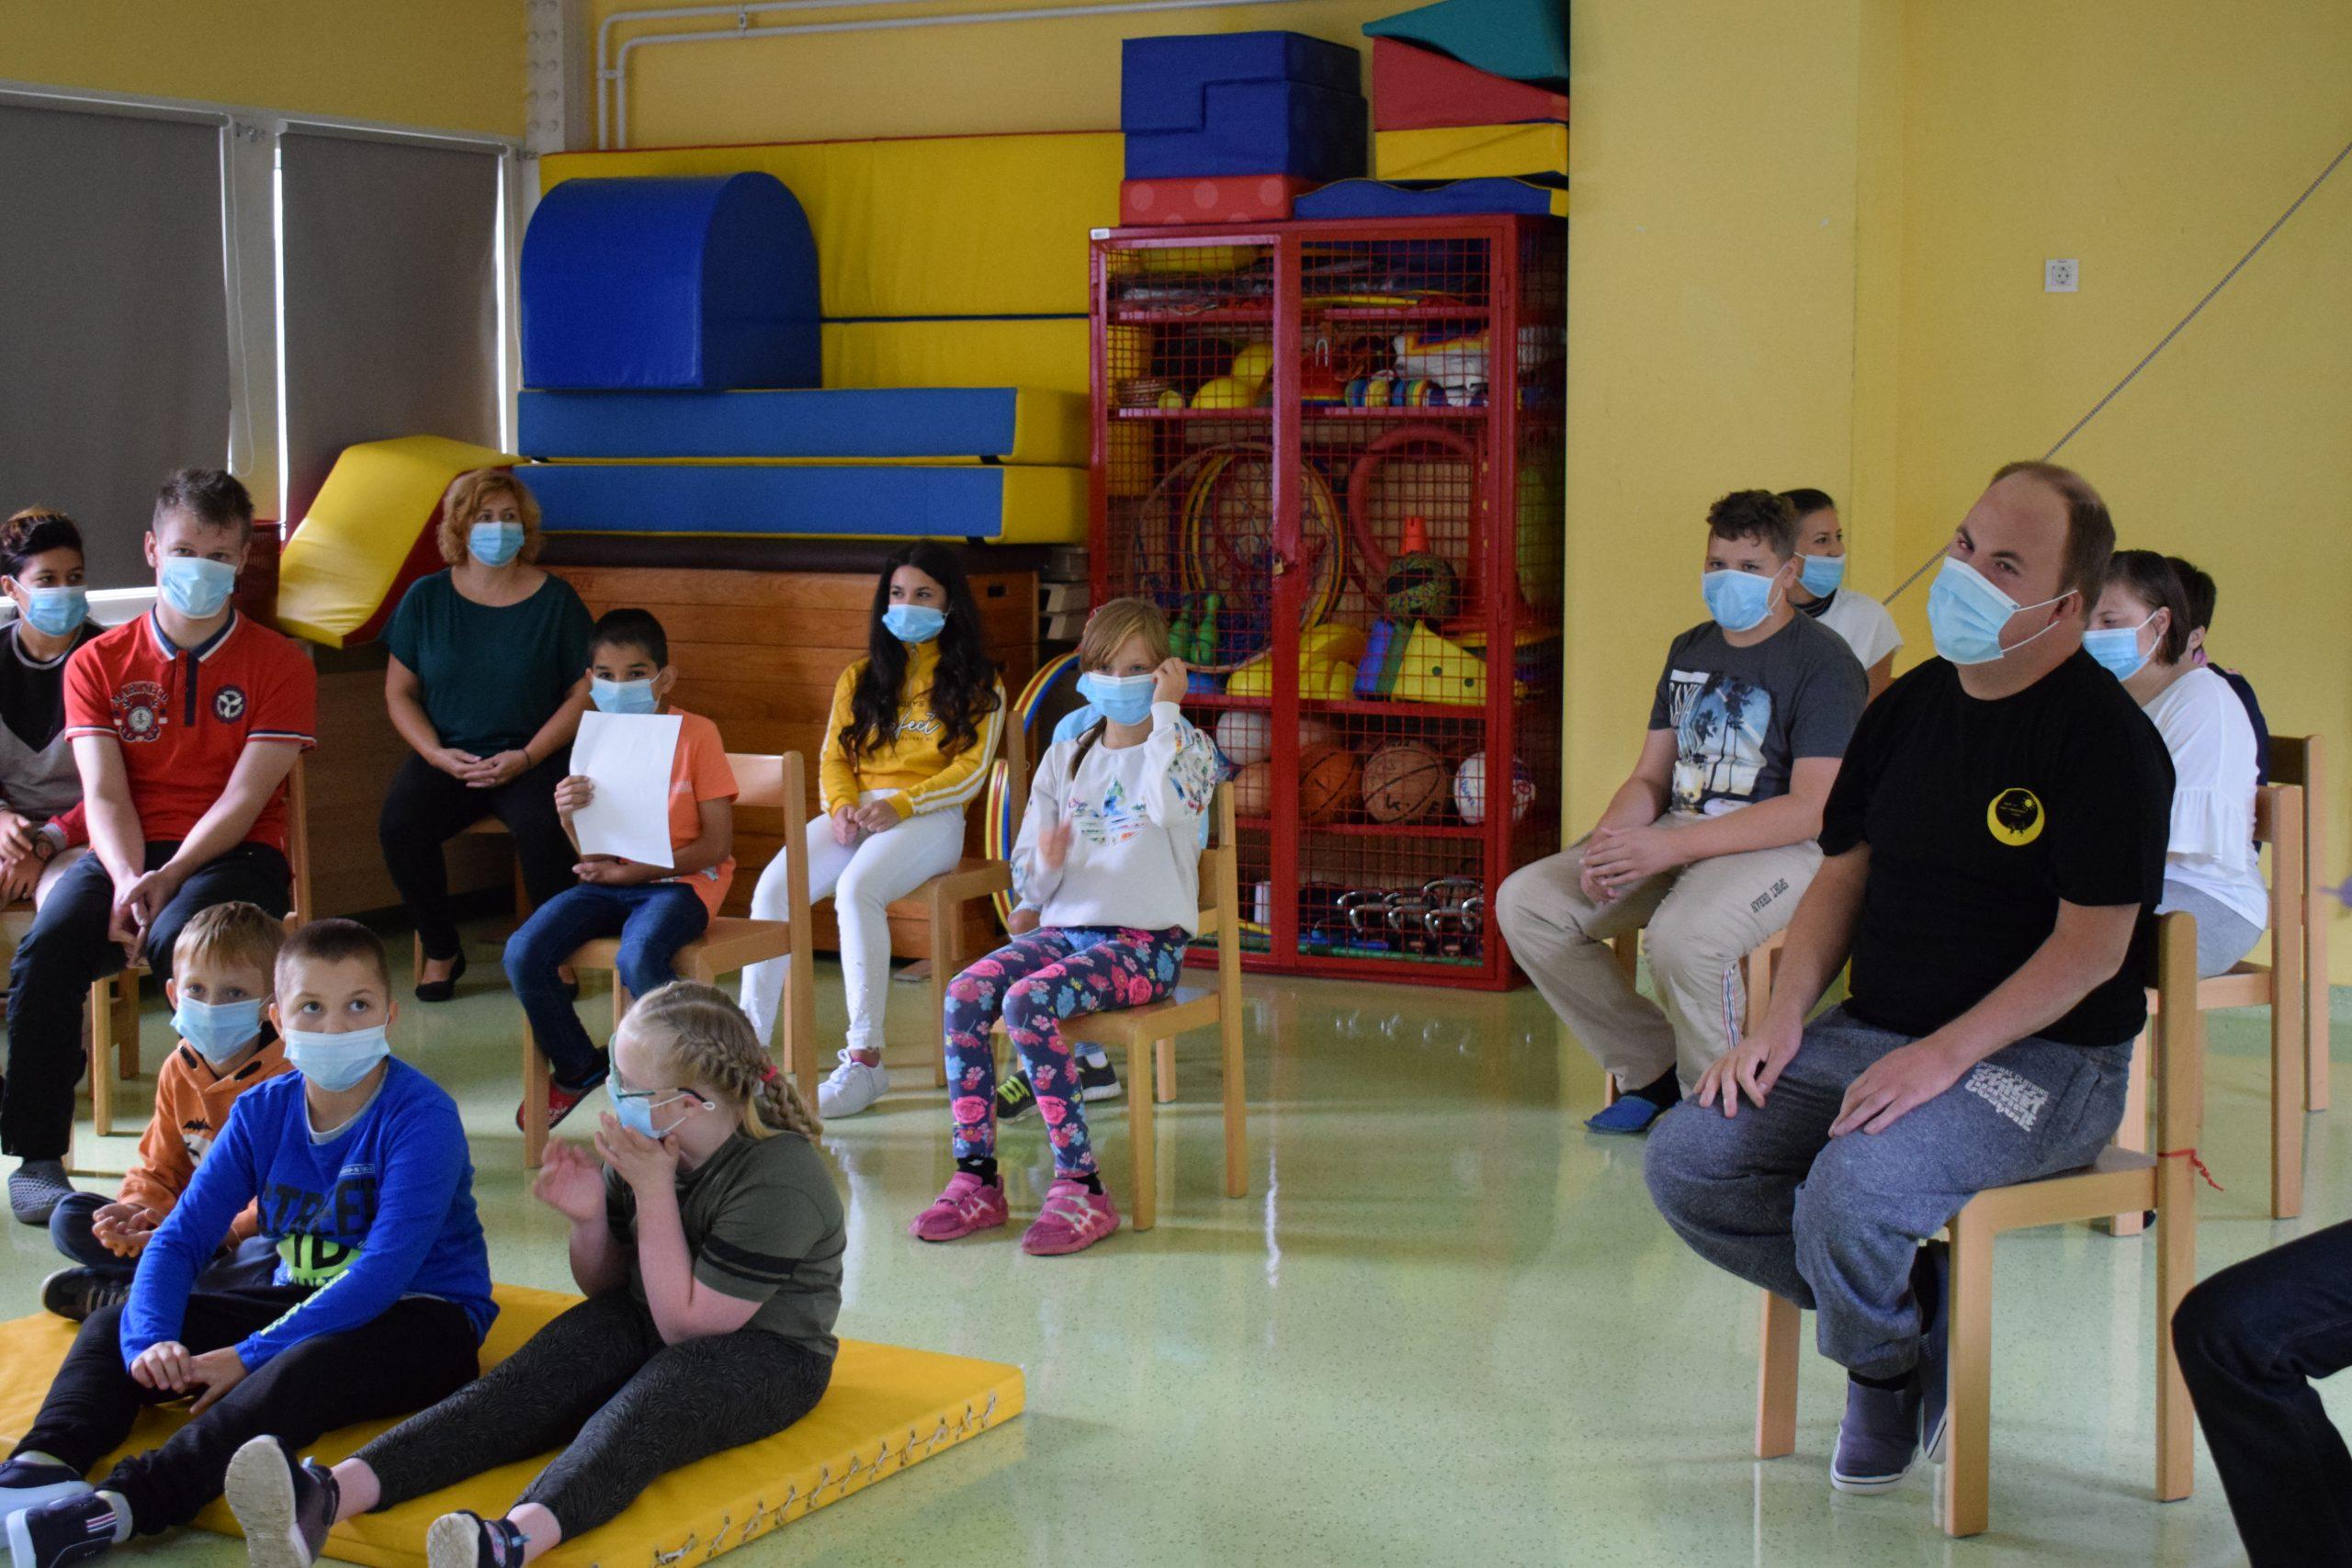 Prvi šolski dan / Az első iskolai nap